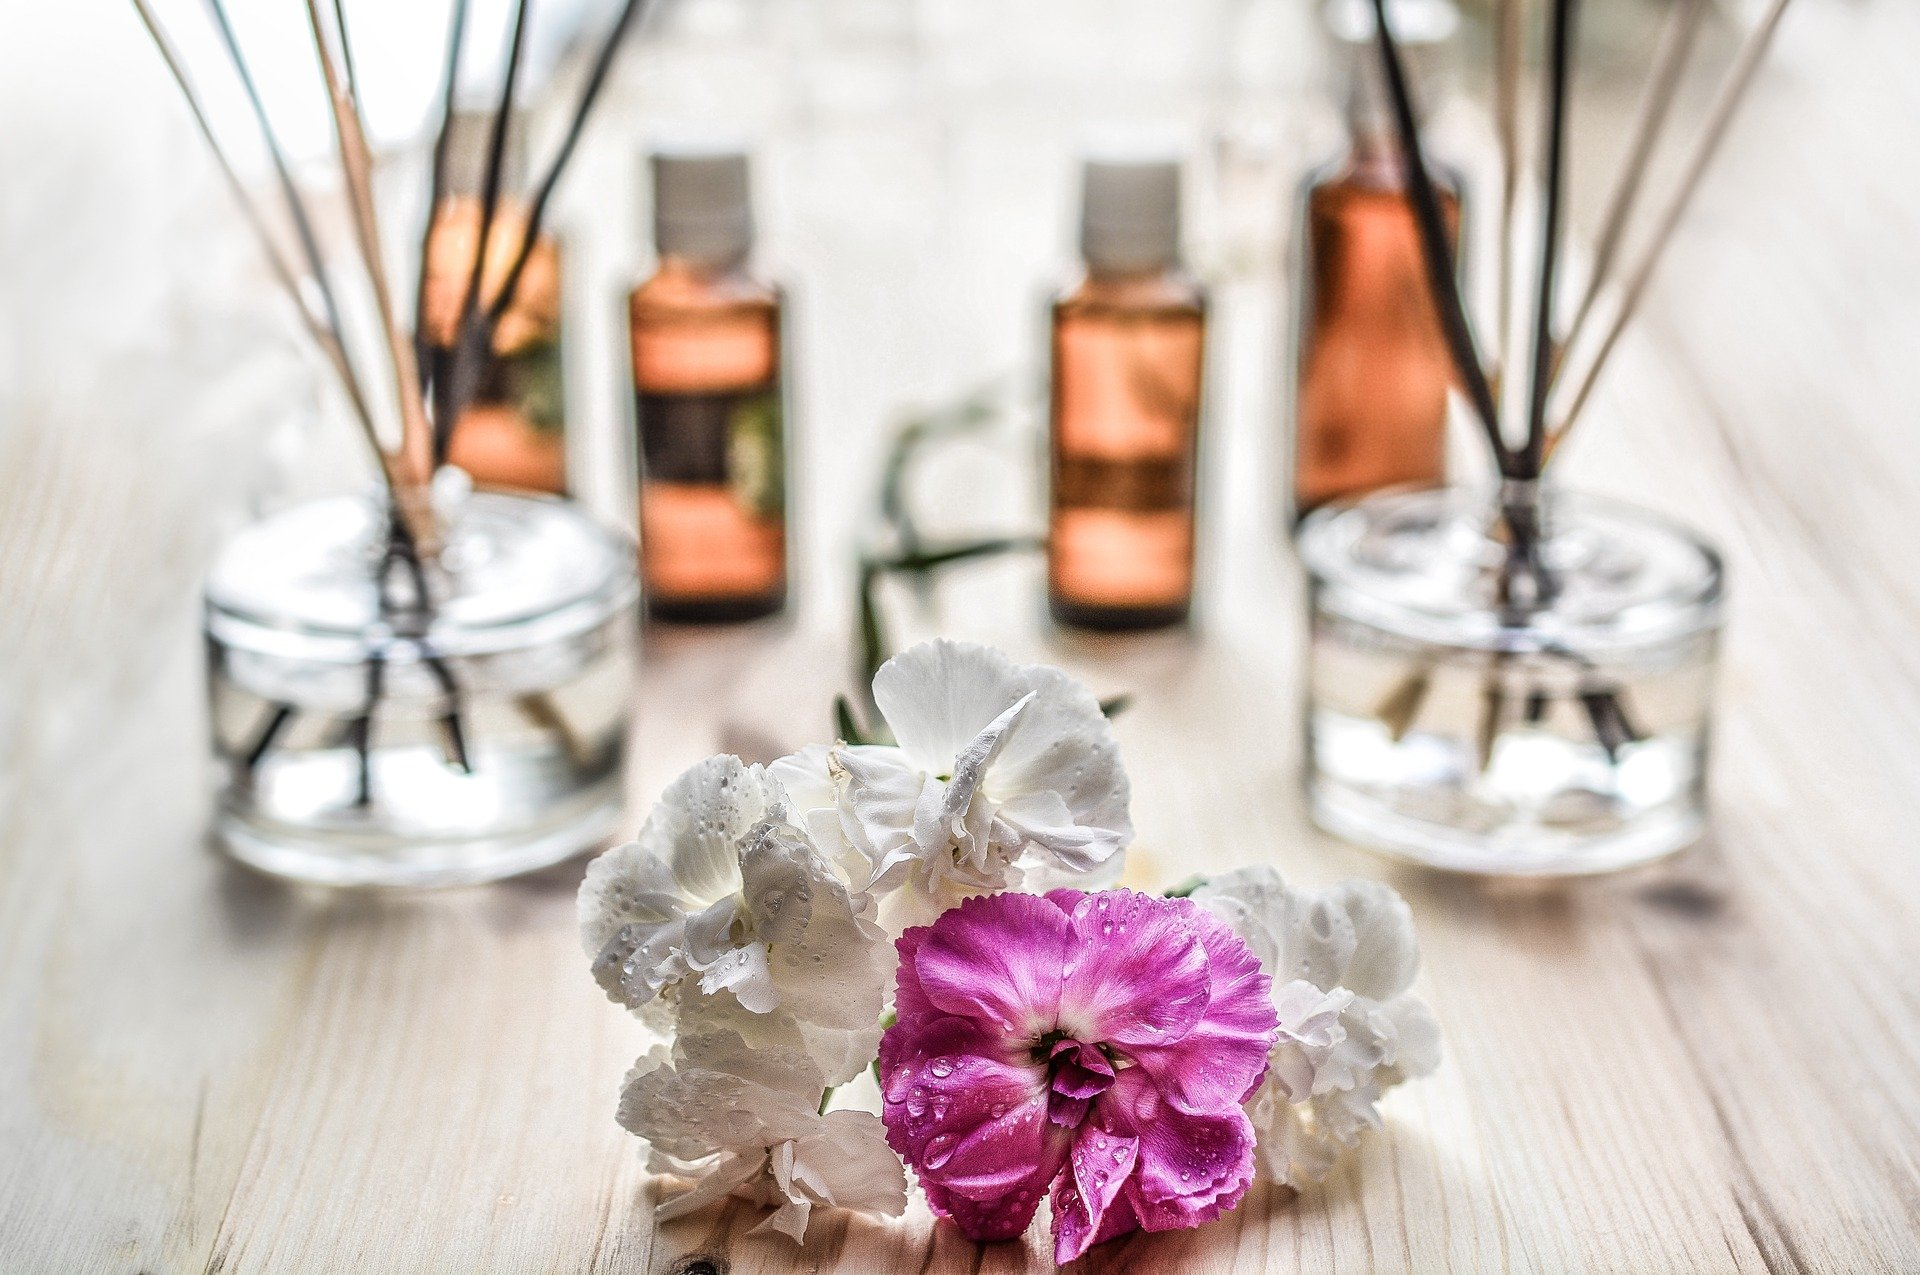 olejki do aromaterapii